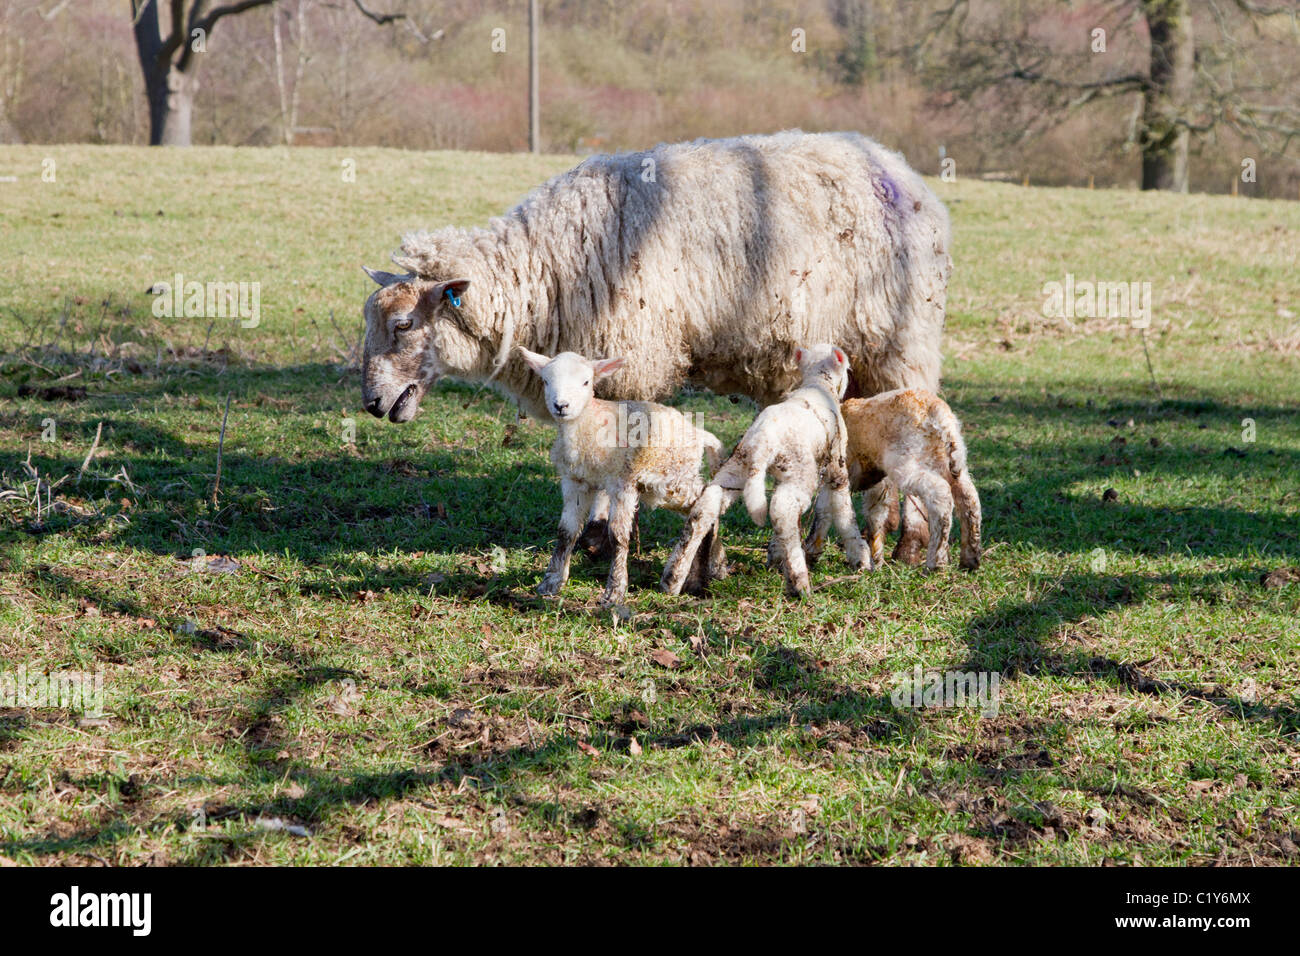 ewe with newborn triplets - Stock Image